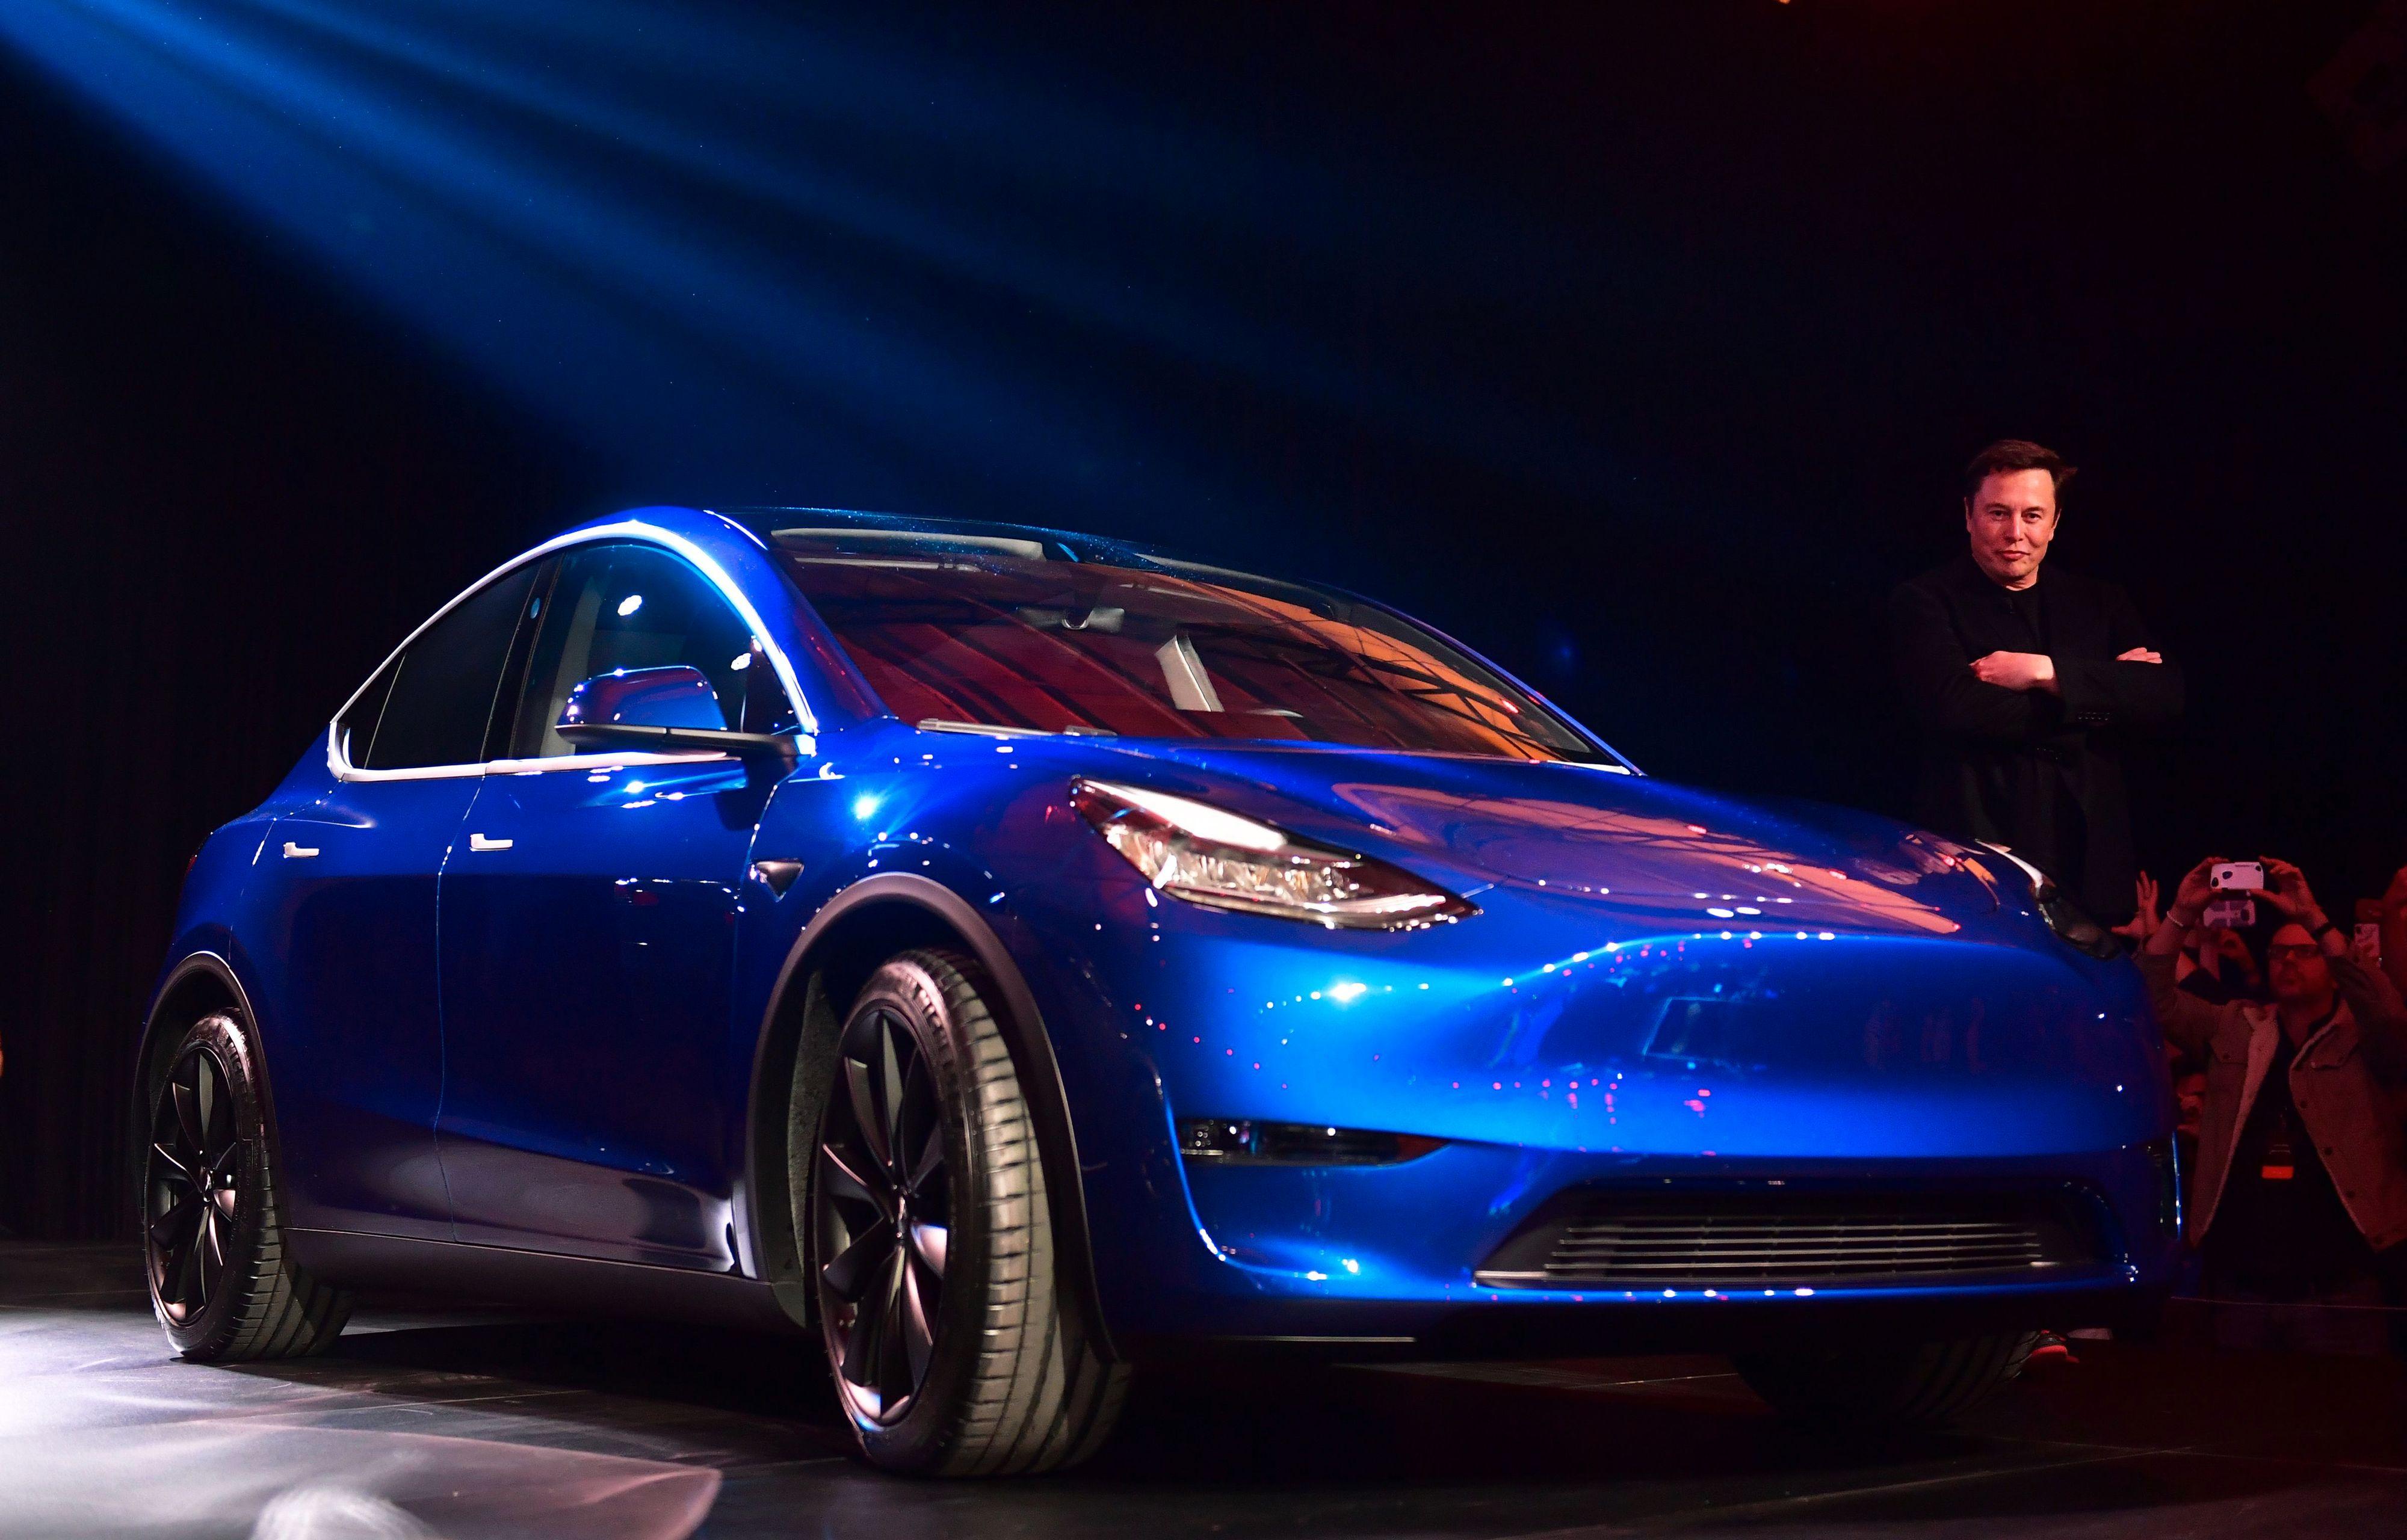 Tesla-sjef Elon Musk viste frem kompakt-SUV-en Model Y i California natt til fredag, norsk tid.